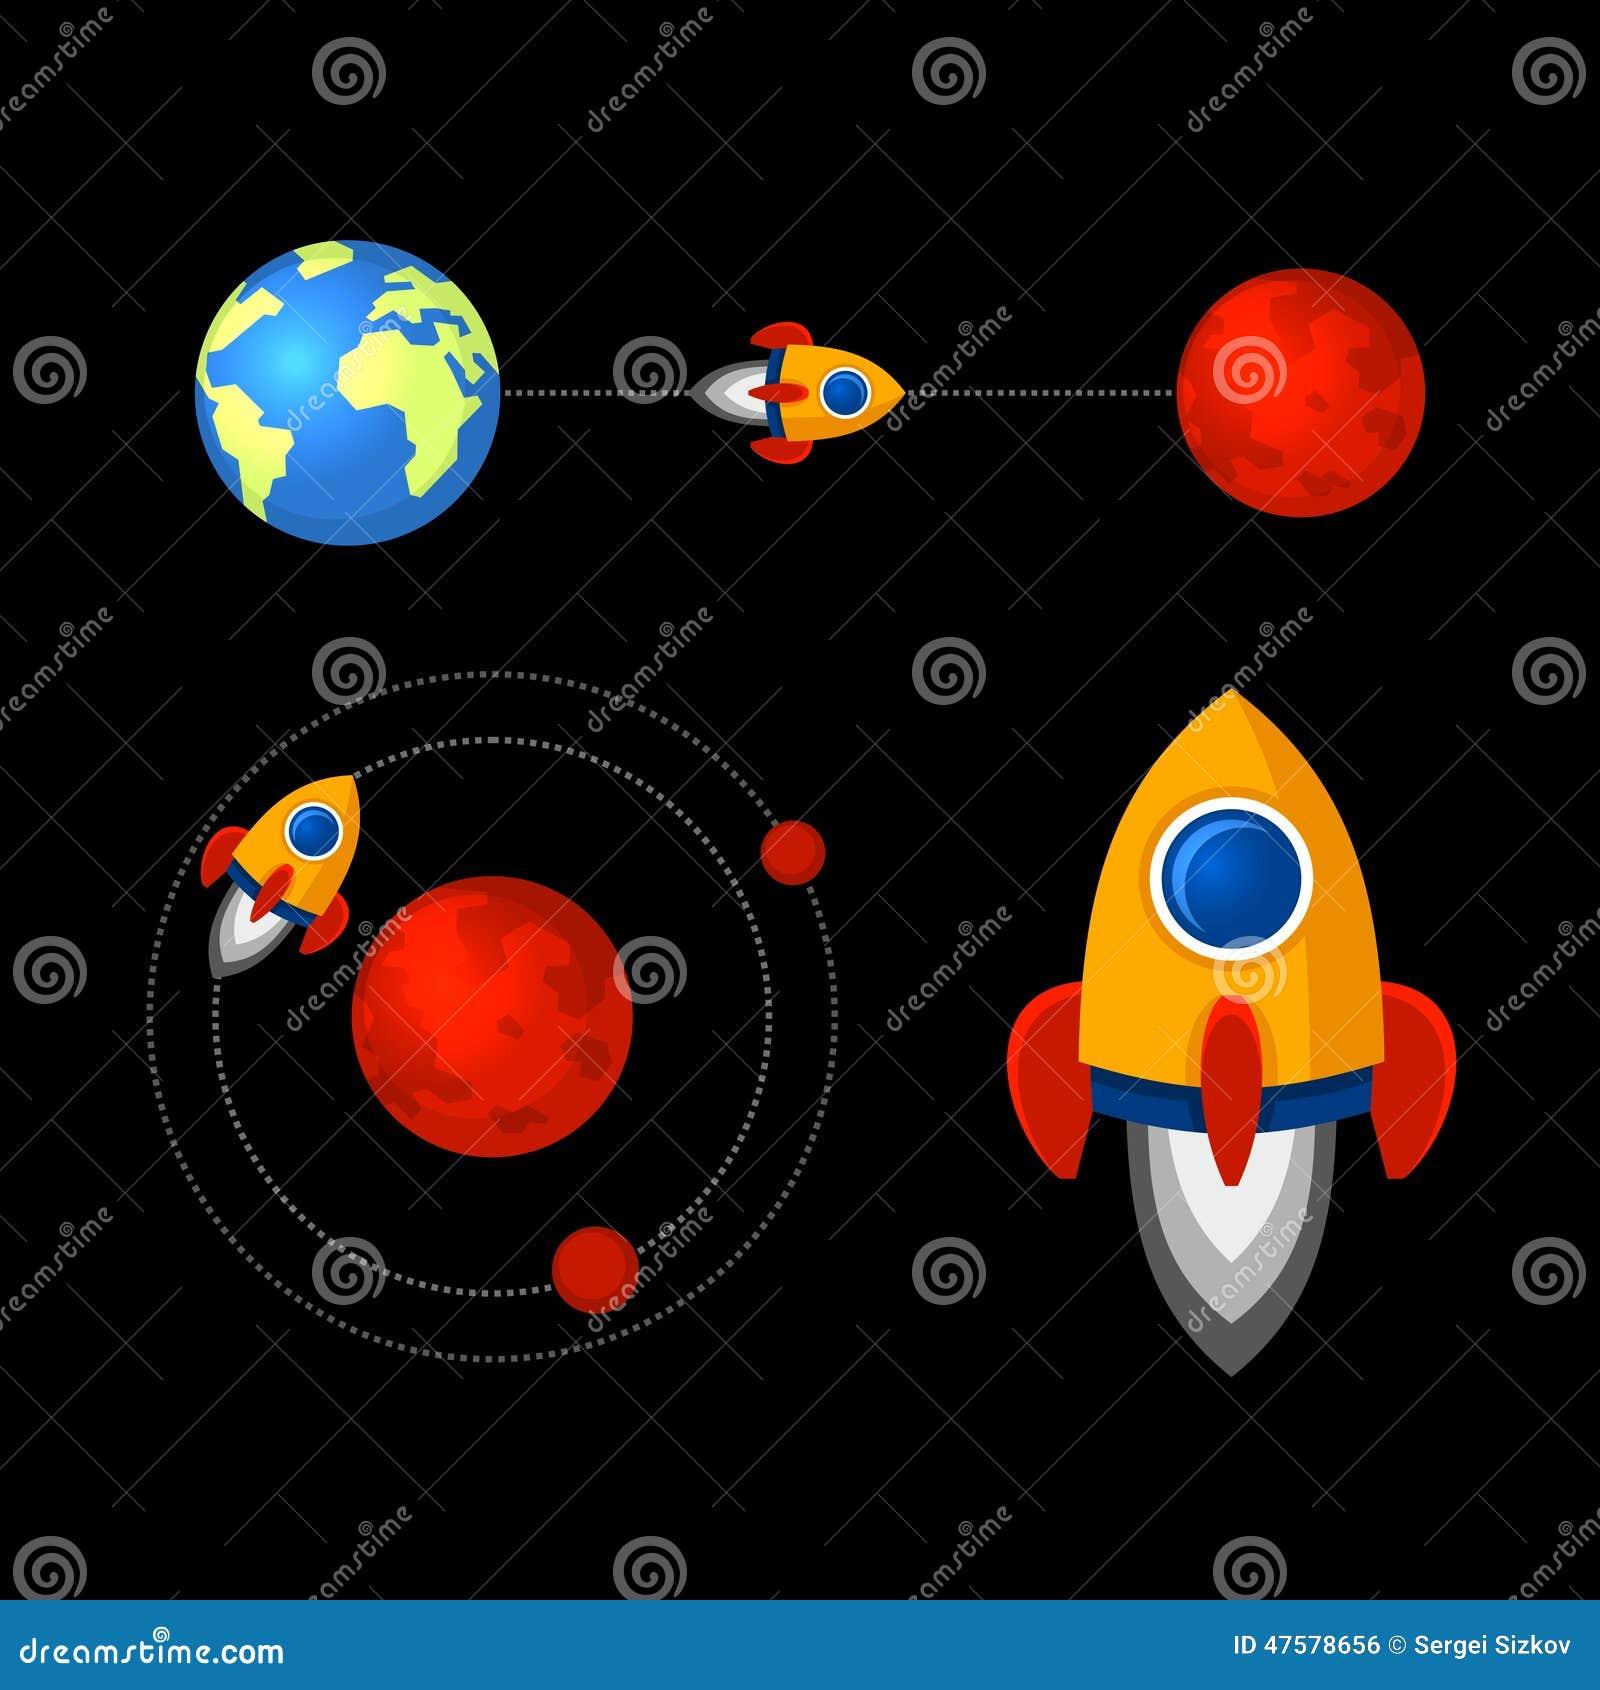 mars planet vector - photo #25